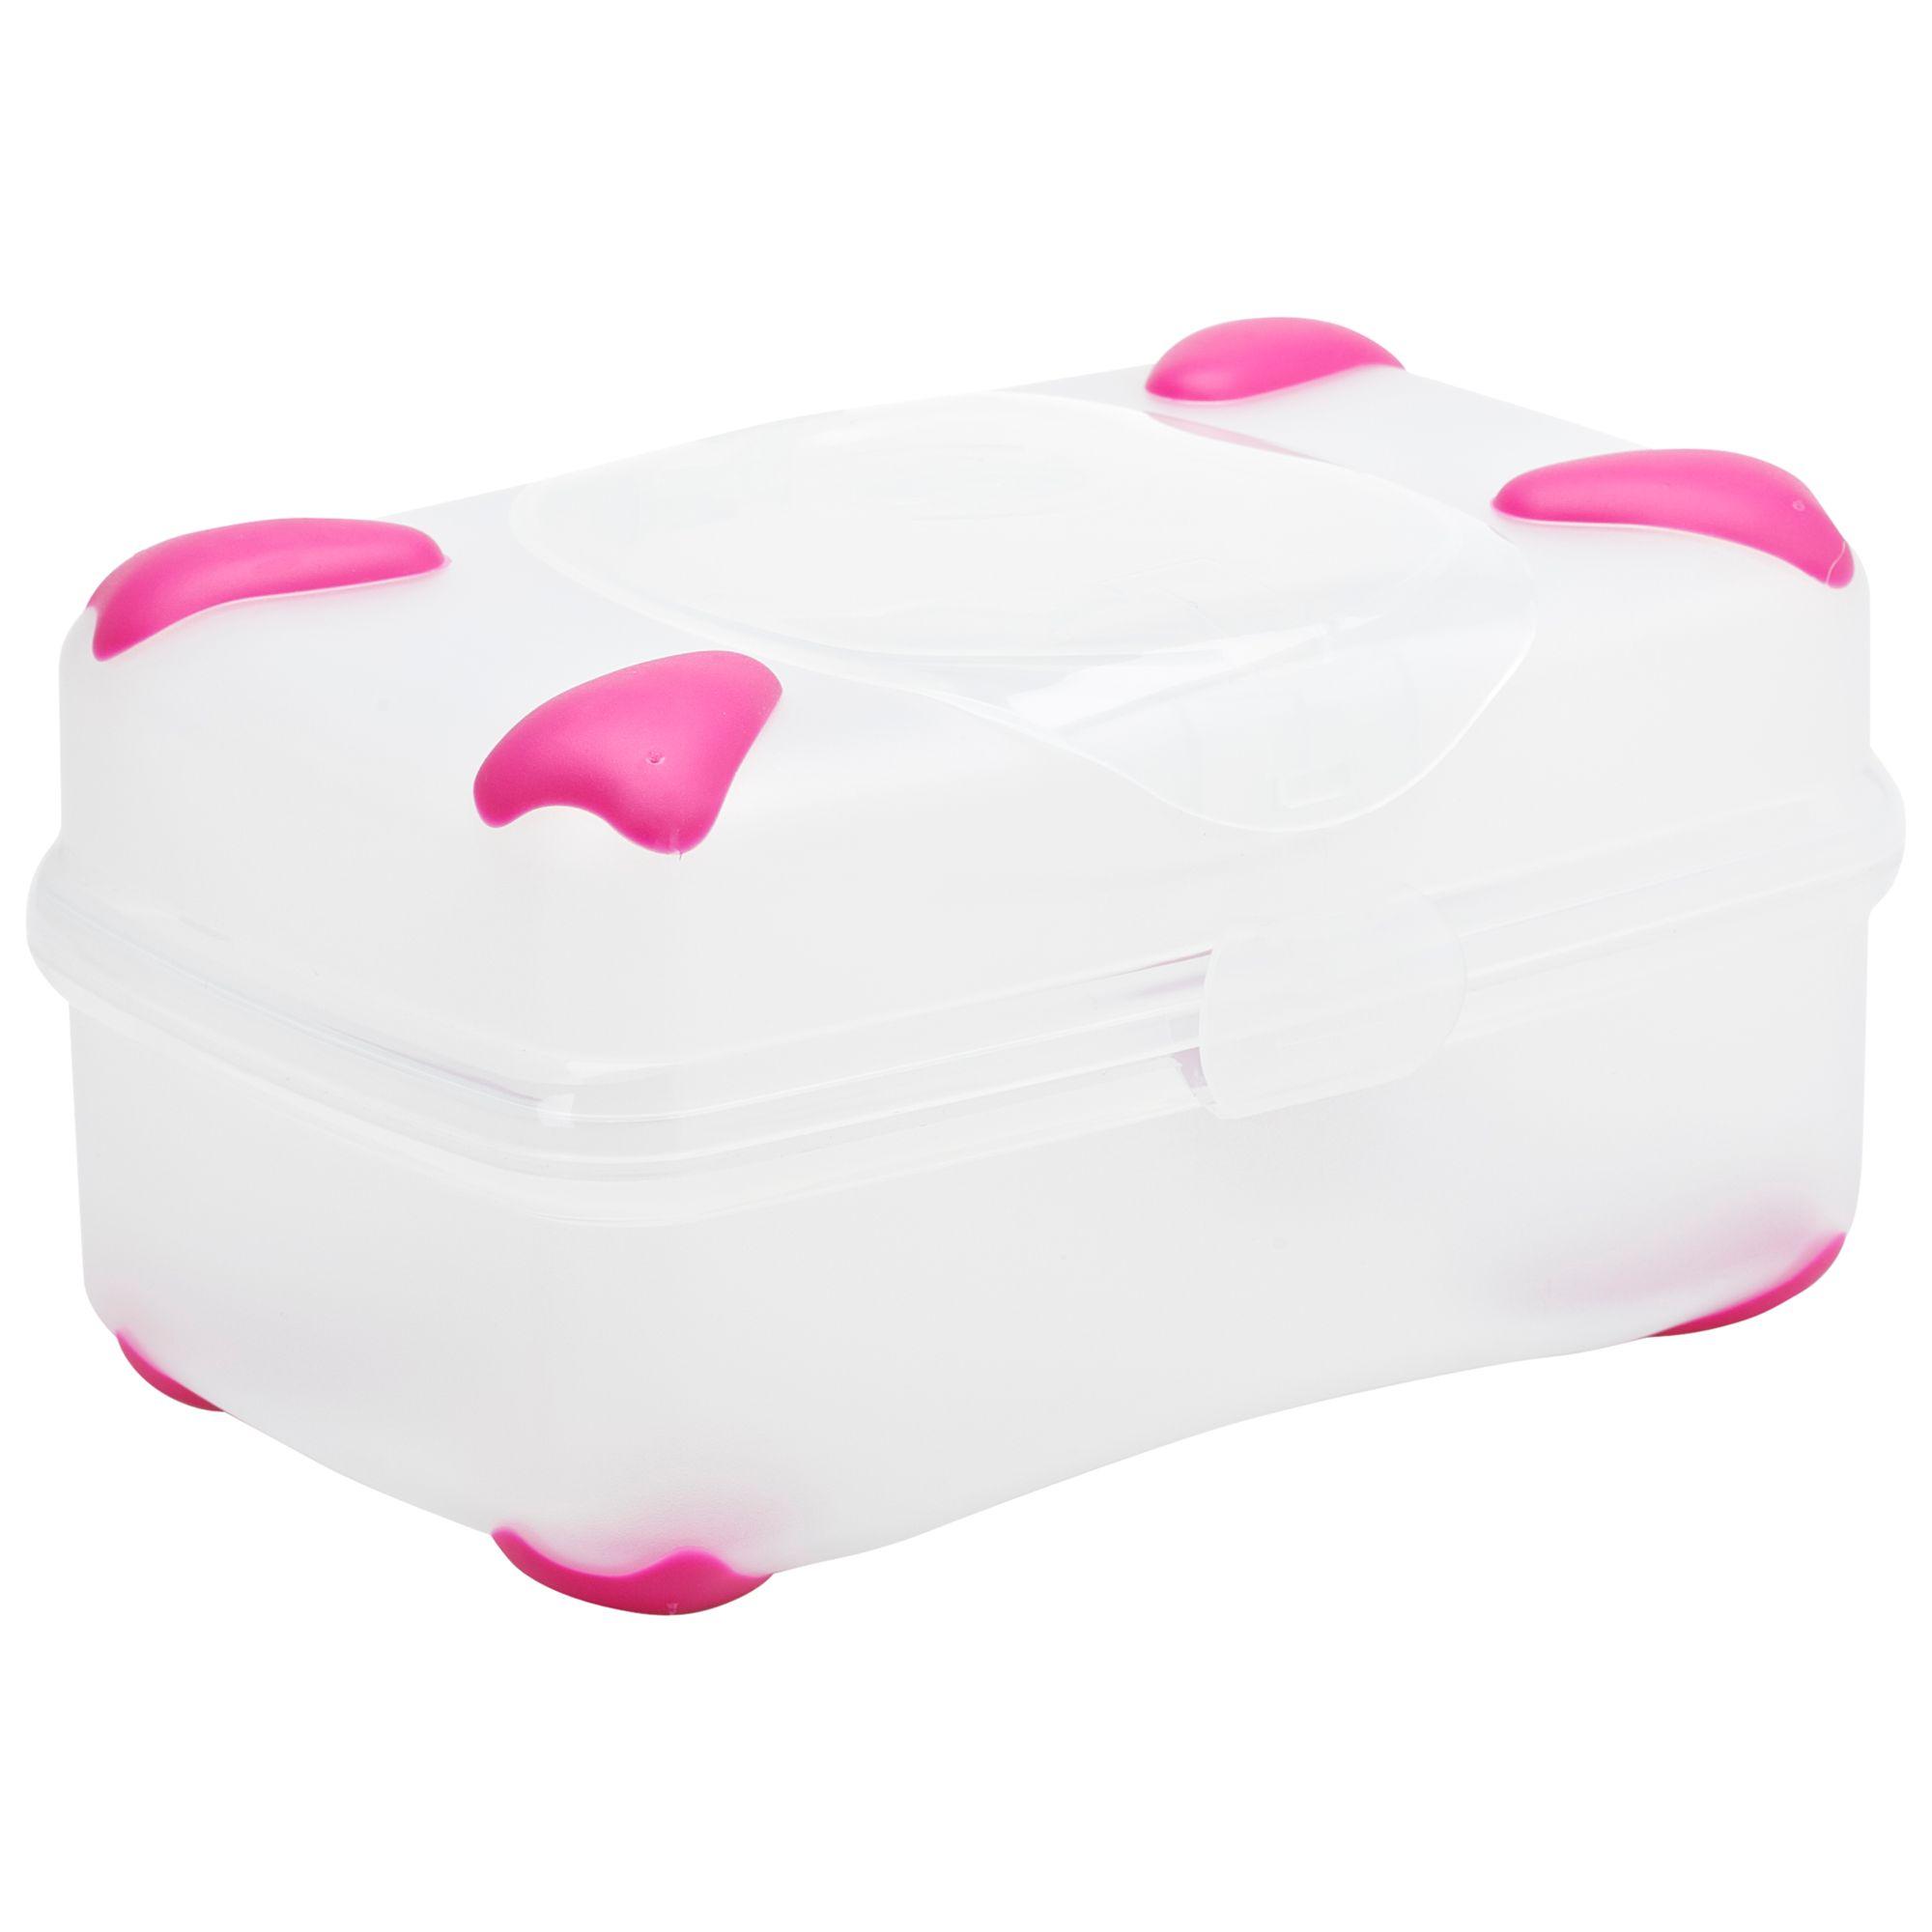 Smash Medium Lunch Box, Assorted